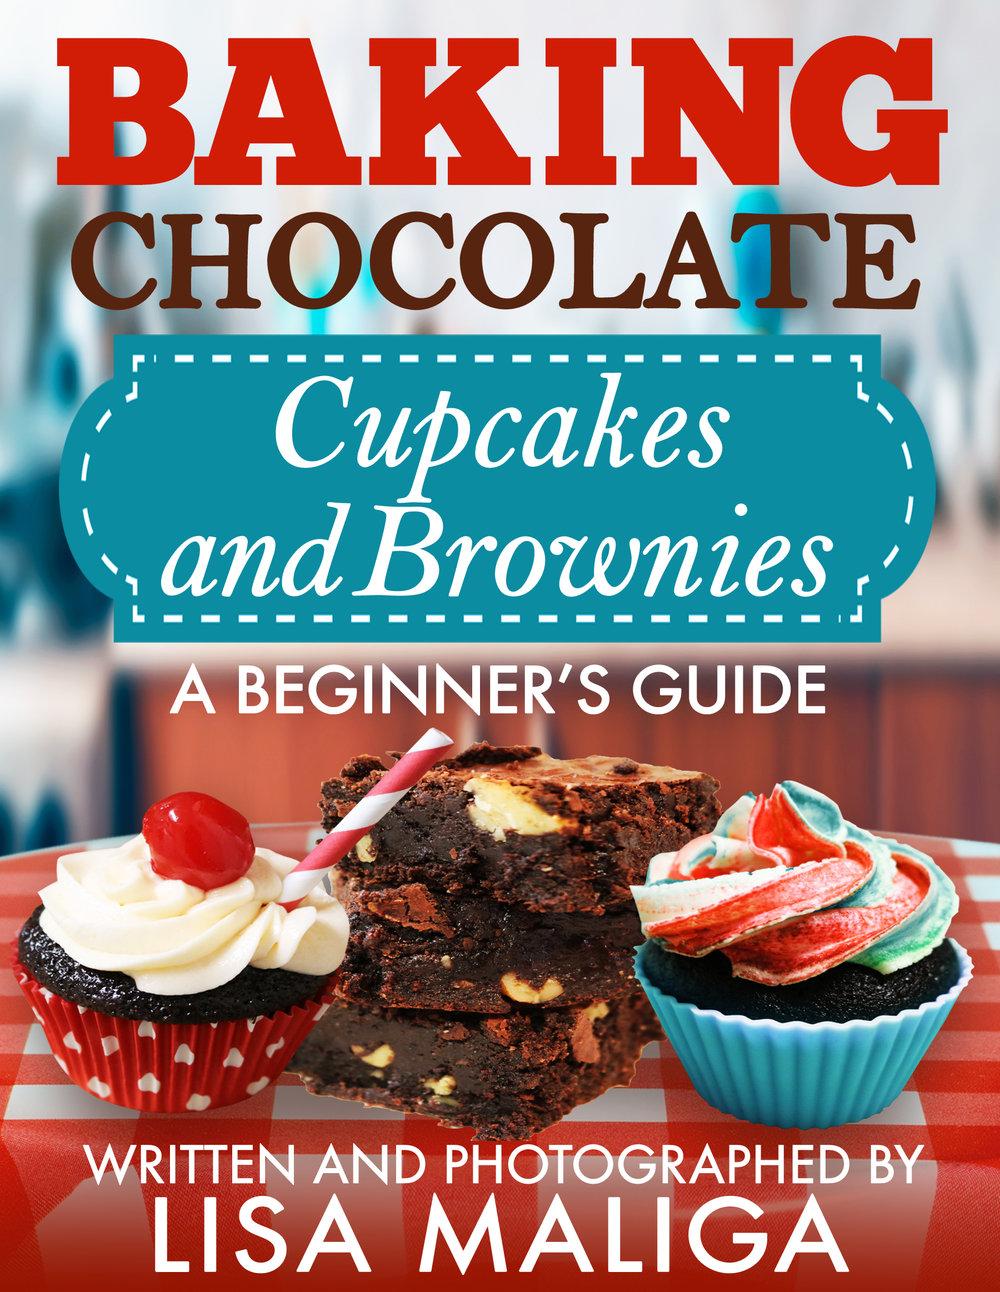 baking-chocolate-cupcakes-and-brownies-final.jpg